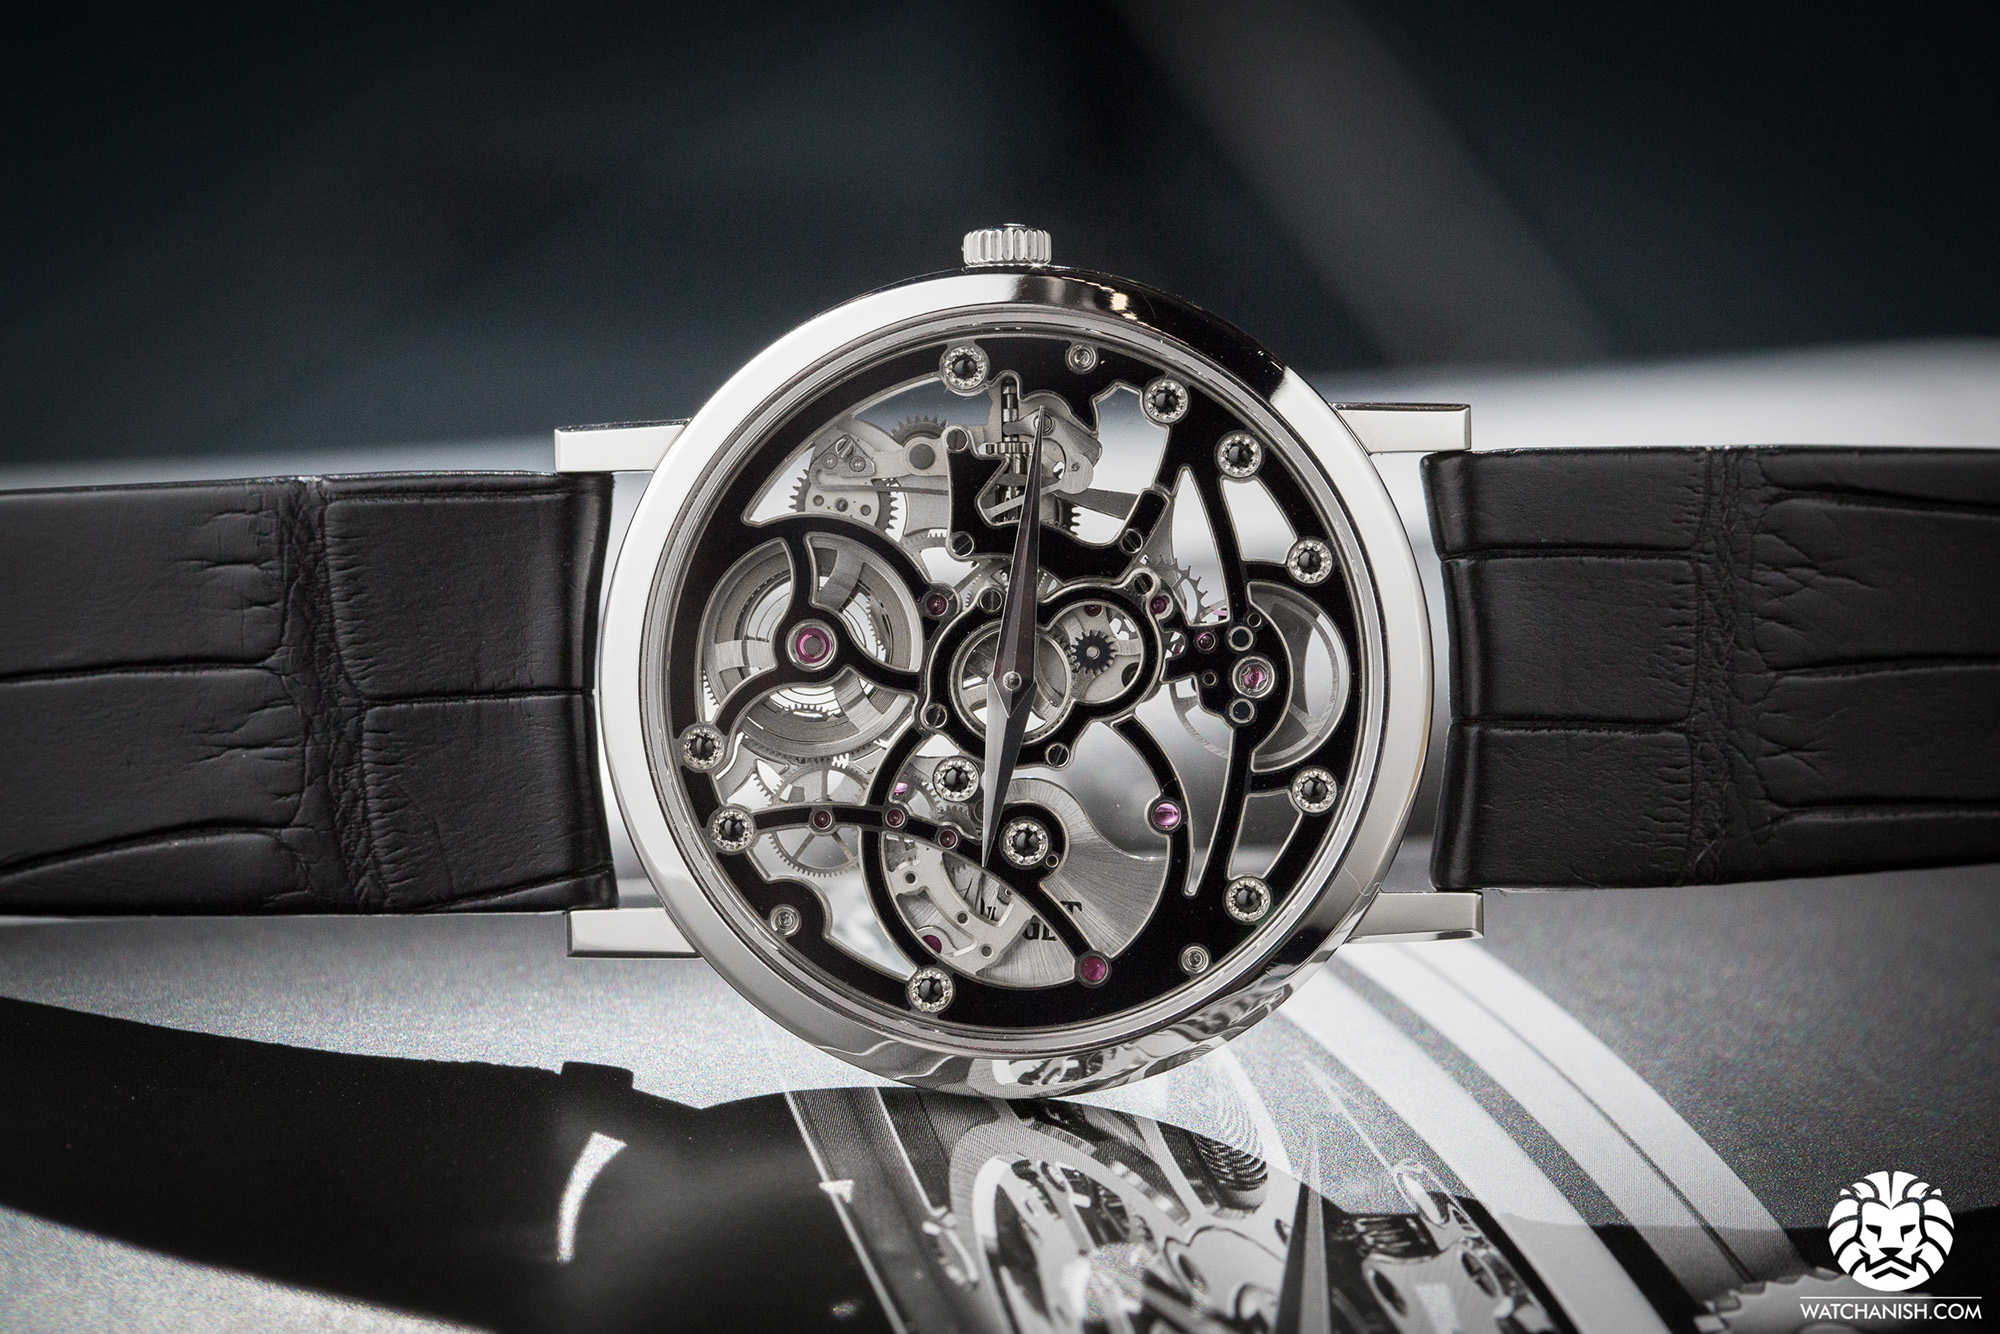 Watches & Wonders 2014 - Piaget Altiplano Skeleton